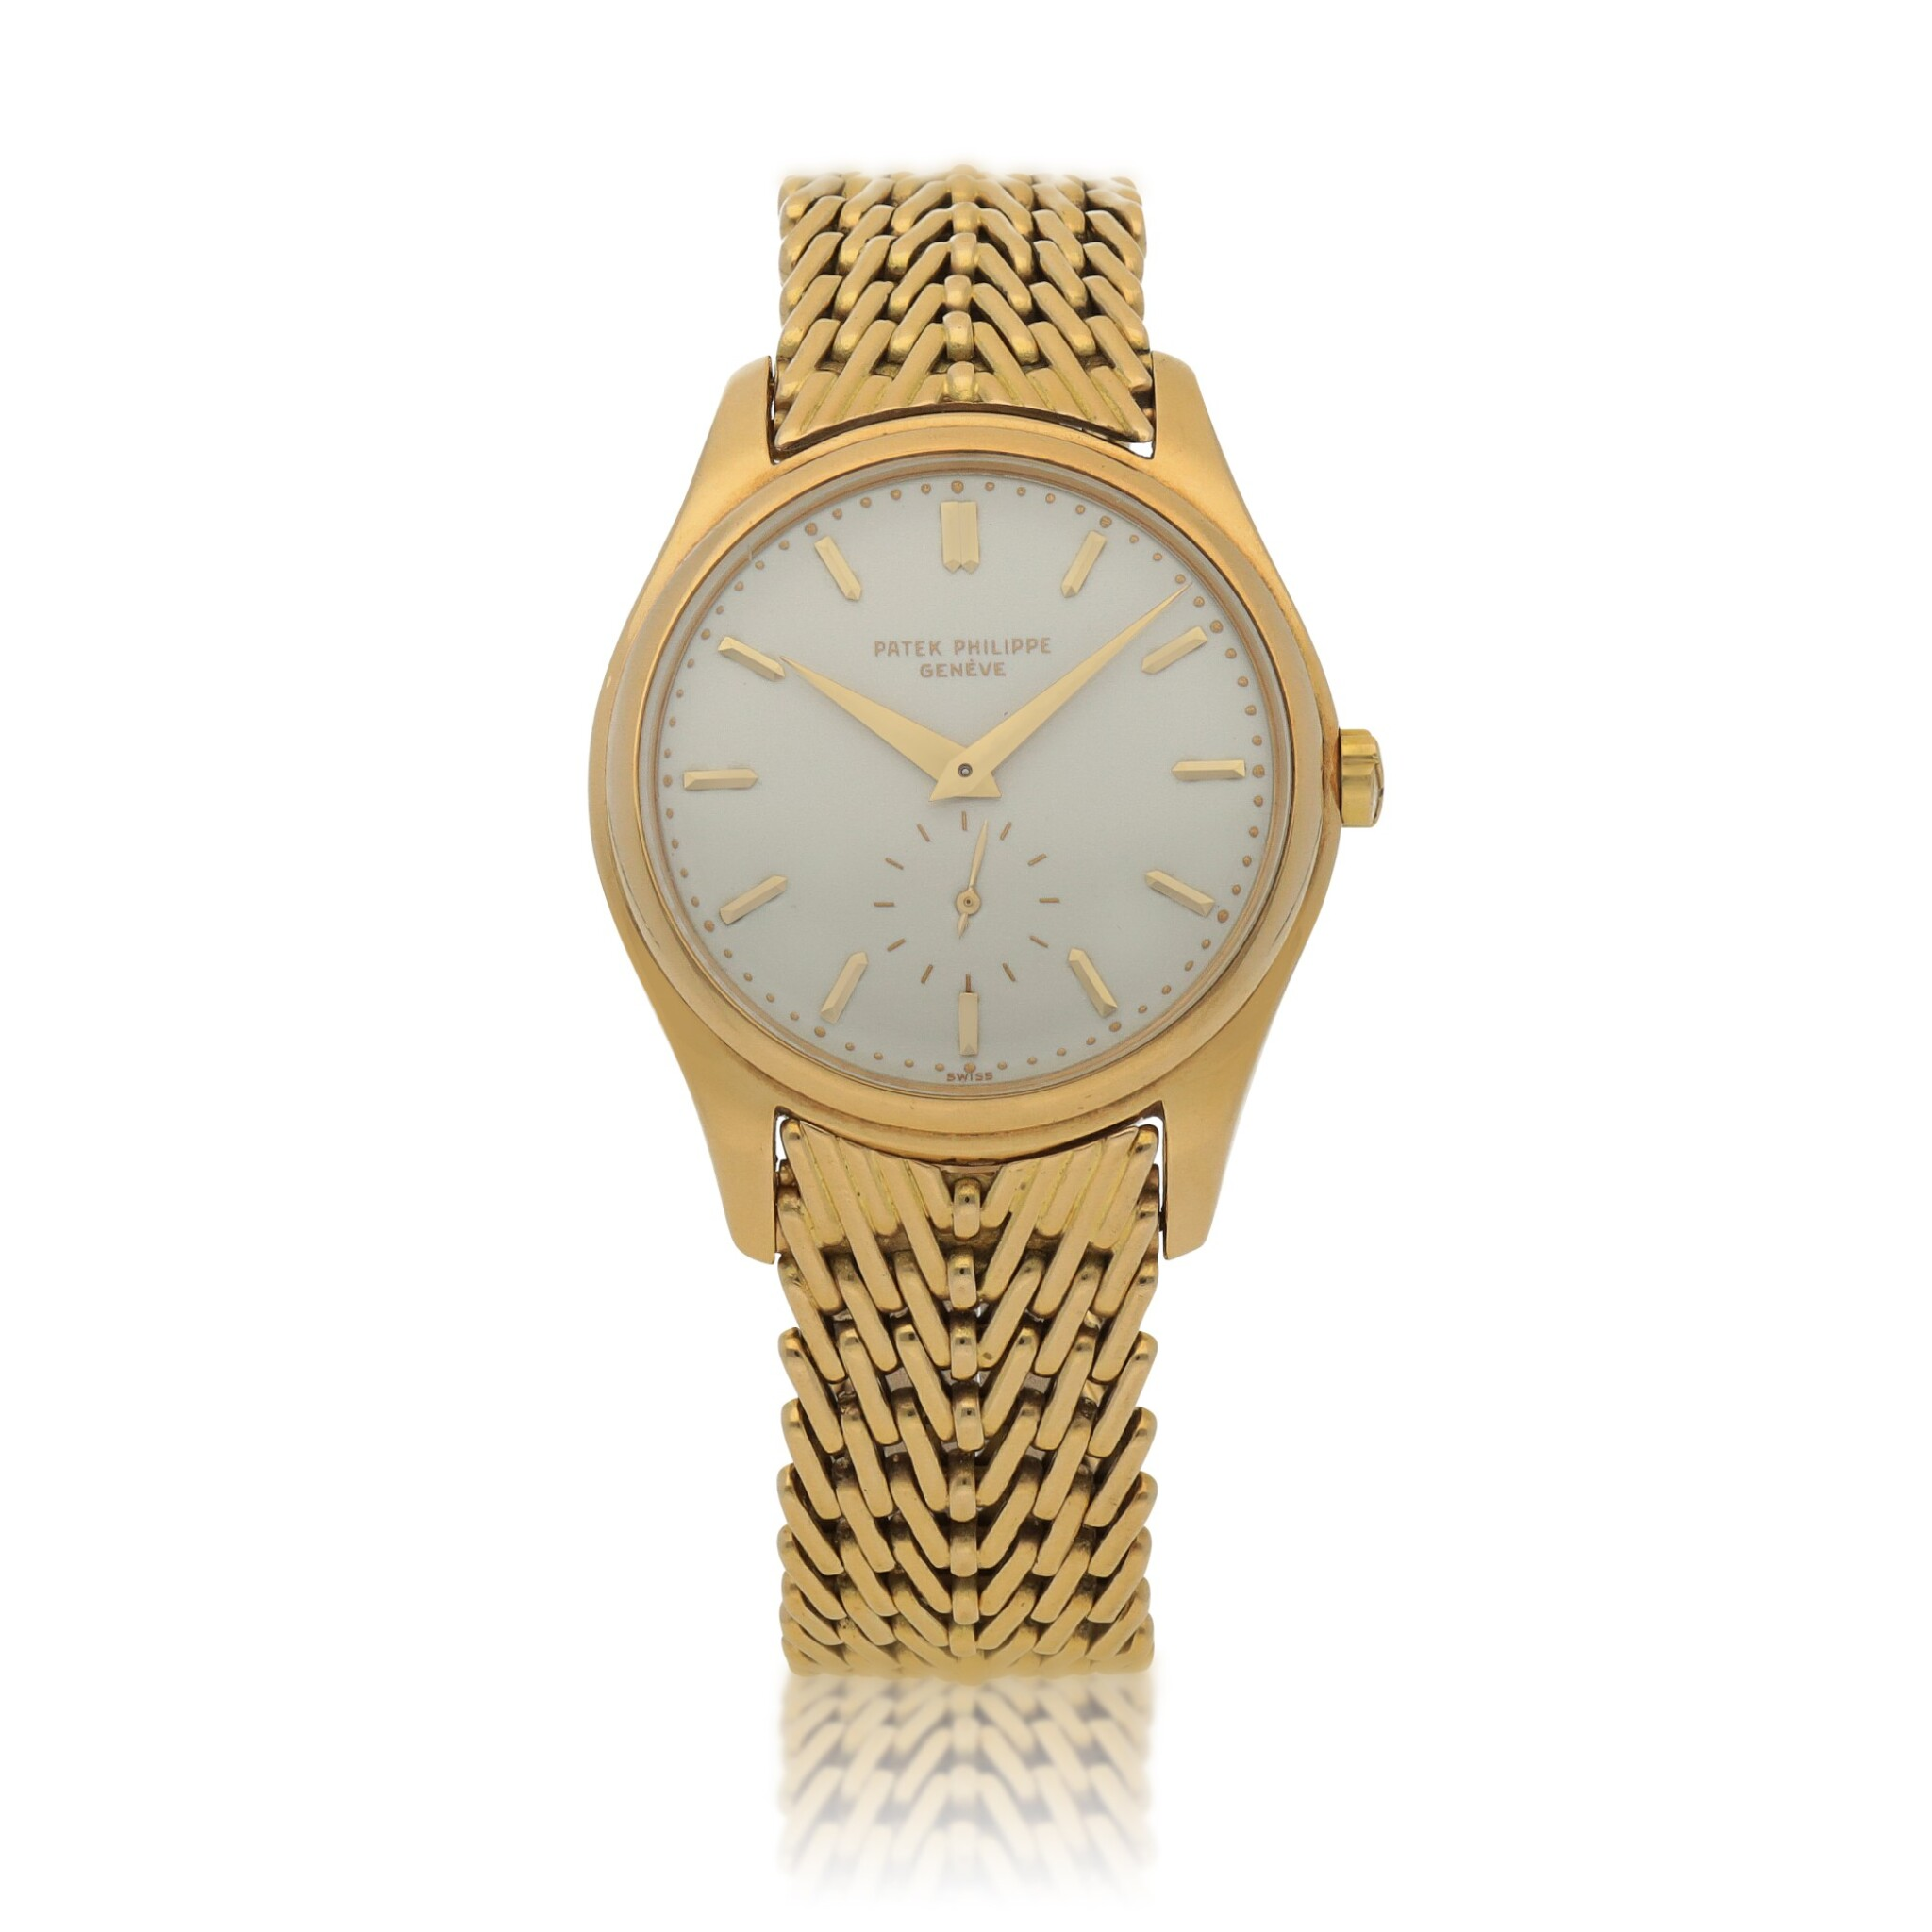 View full screen - View 1 of Lot 79. Ref. 2526J Retailed by Beyer: Yellow gold wristwatch with enamel dial and bracelet Made in 1954 | 零售商為Beyer:百達翡麗 2526J型號黃金鍊帶腕錶配琺瑯錶盤,1954年製.